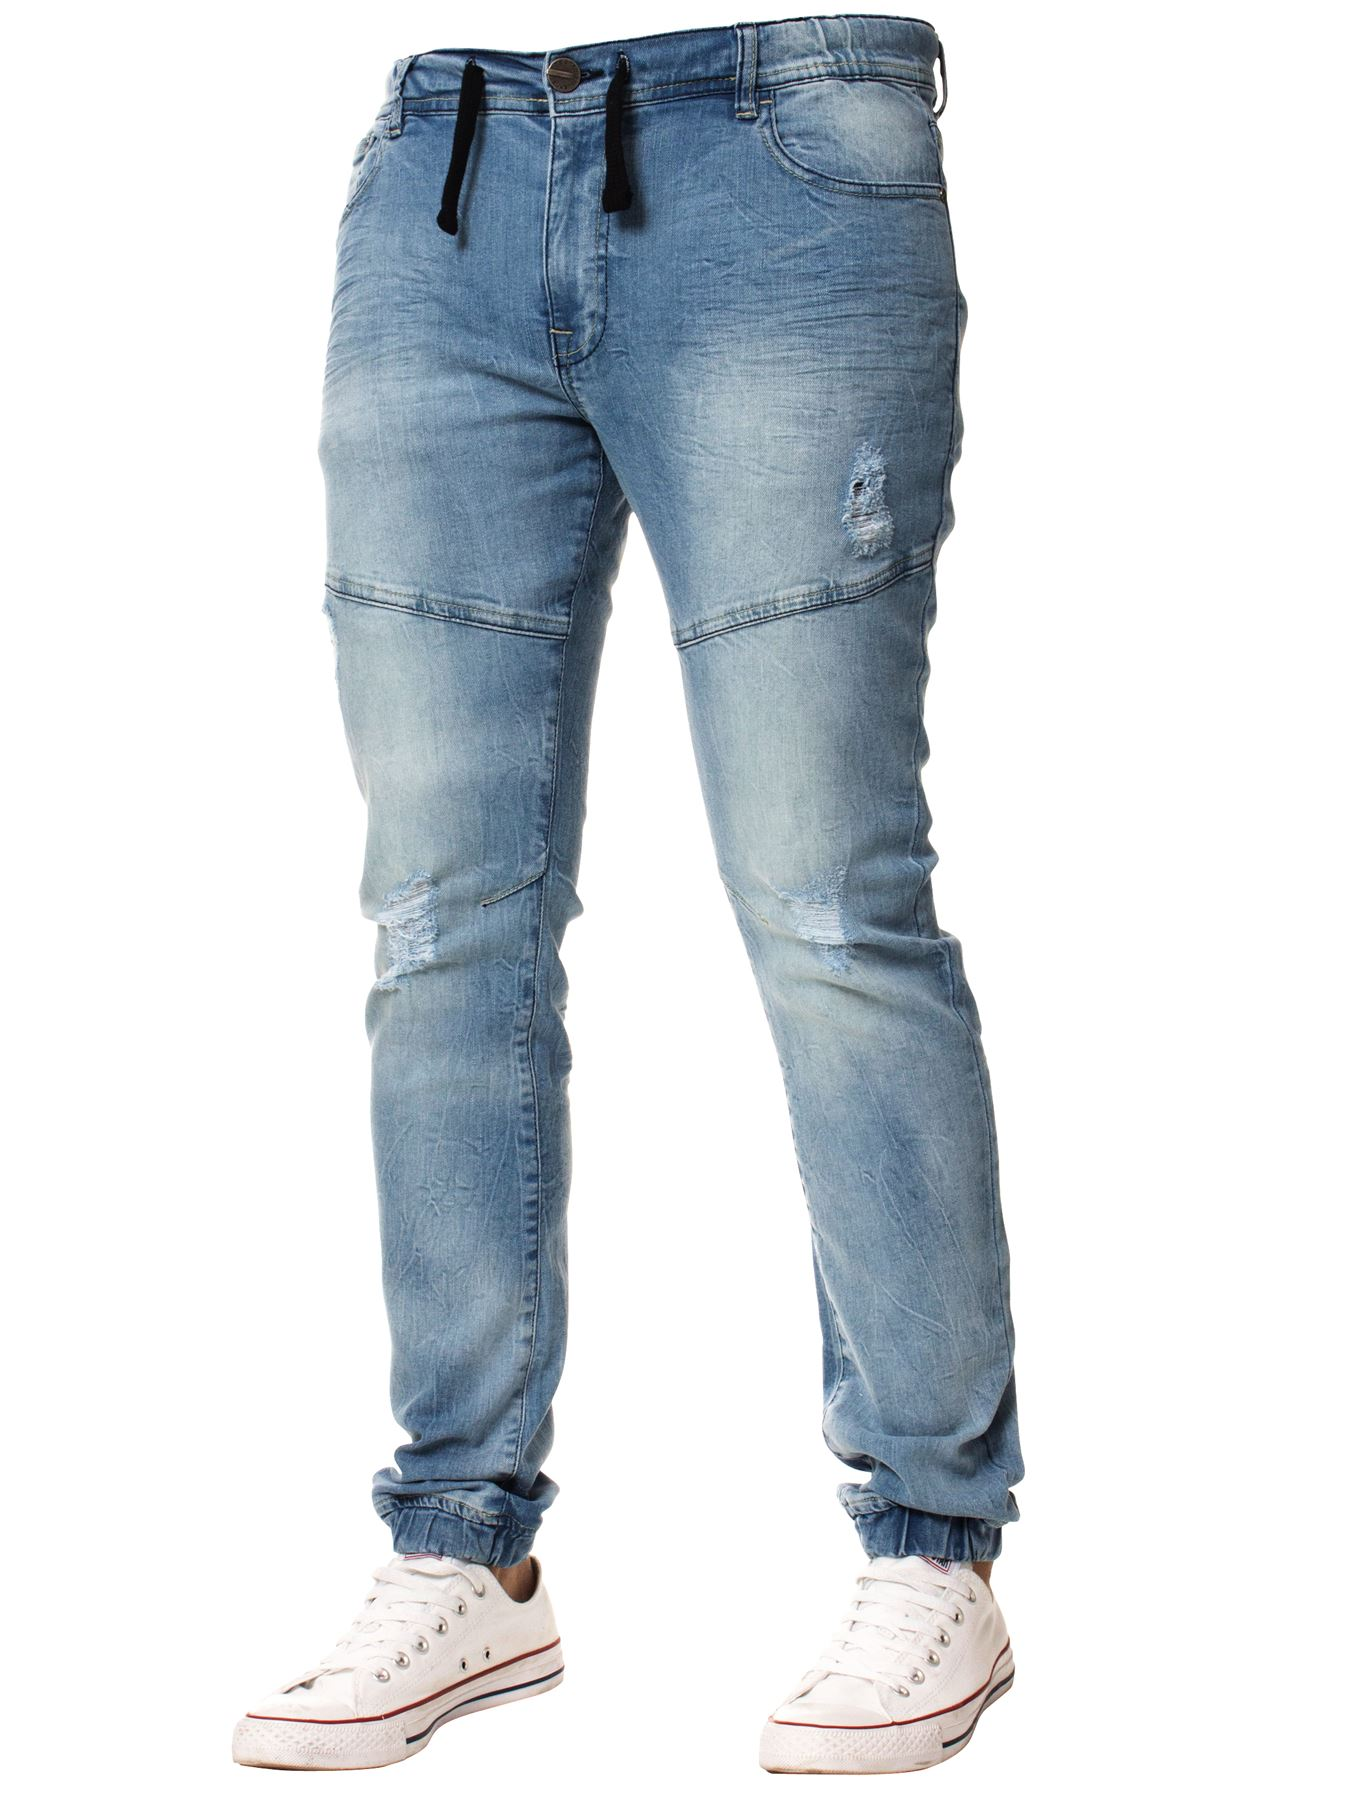 Enzo-Mens-Cuffed-Jeans-Stretch-Fit-Ripped-Denim-Jogger-Pants-Big-Tall-All-Waists thumbnail 10